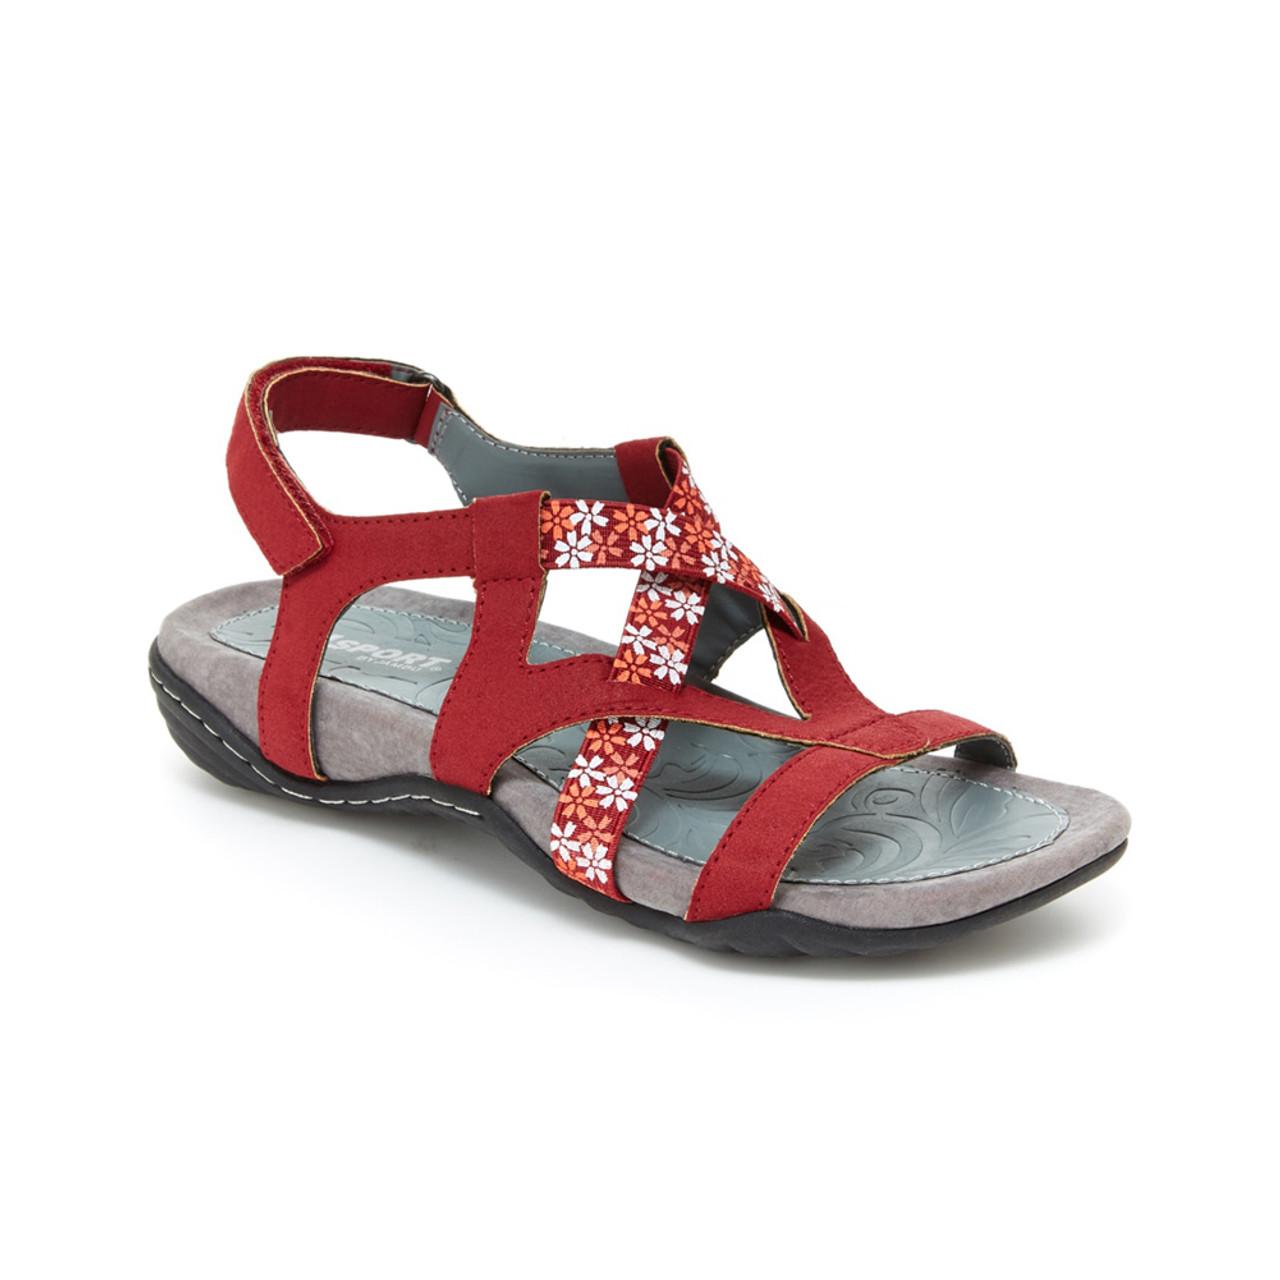 3a31afc7979 Jsport By Jambu Women s Woodland Sandal Red - Shop now   Shoolu.com